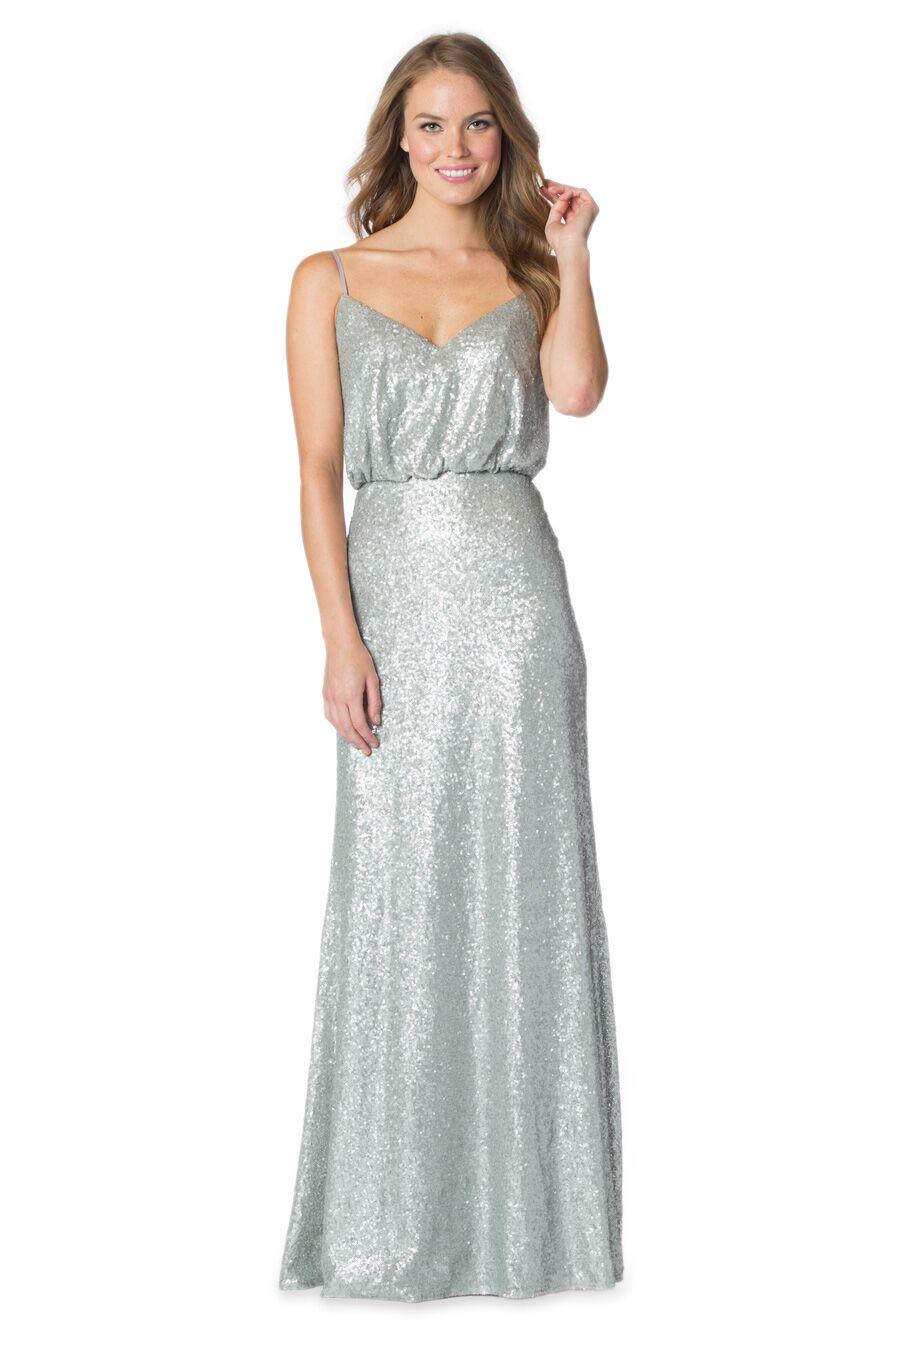 125 Bridal Boutique - Plaistow, NH